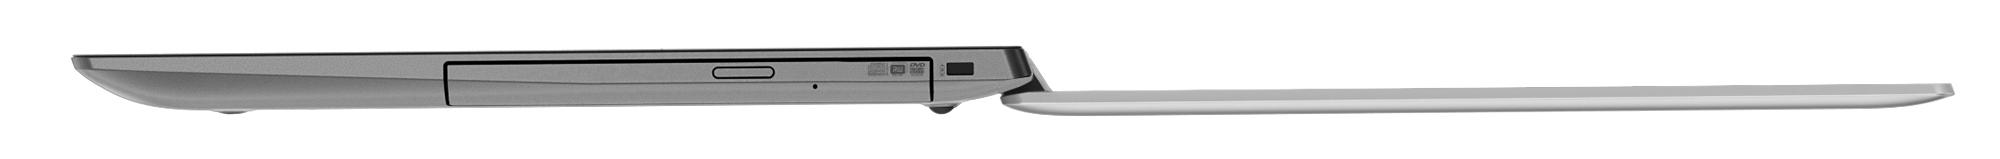 Фото  Ноутбук Lenovo ideapad 330-15 Platinum Grey (81D600K0RA)